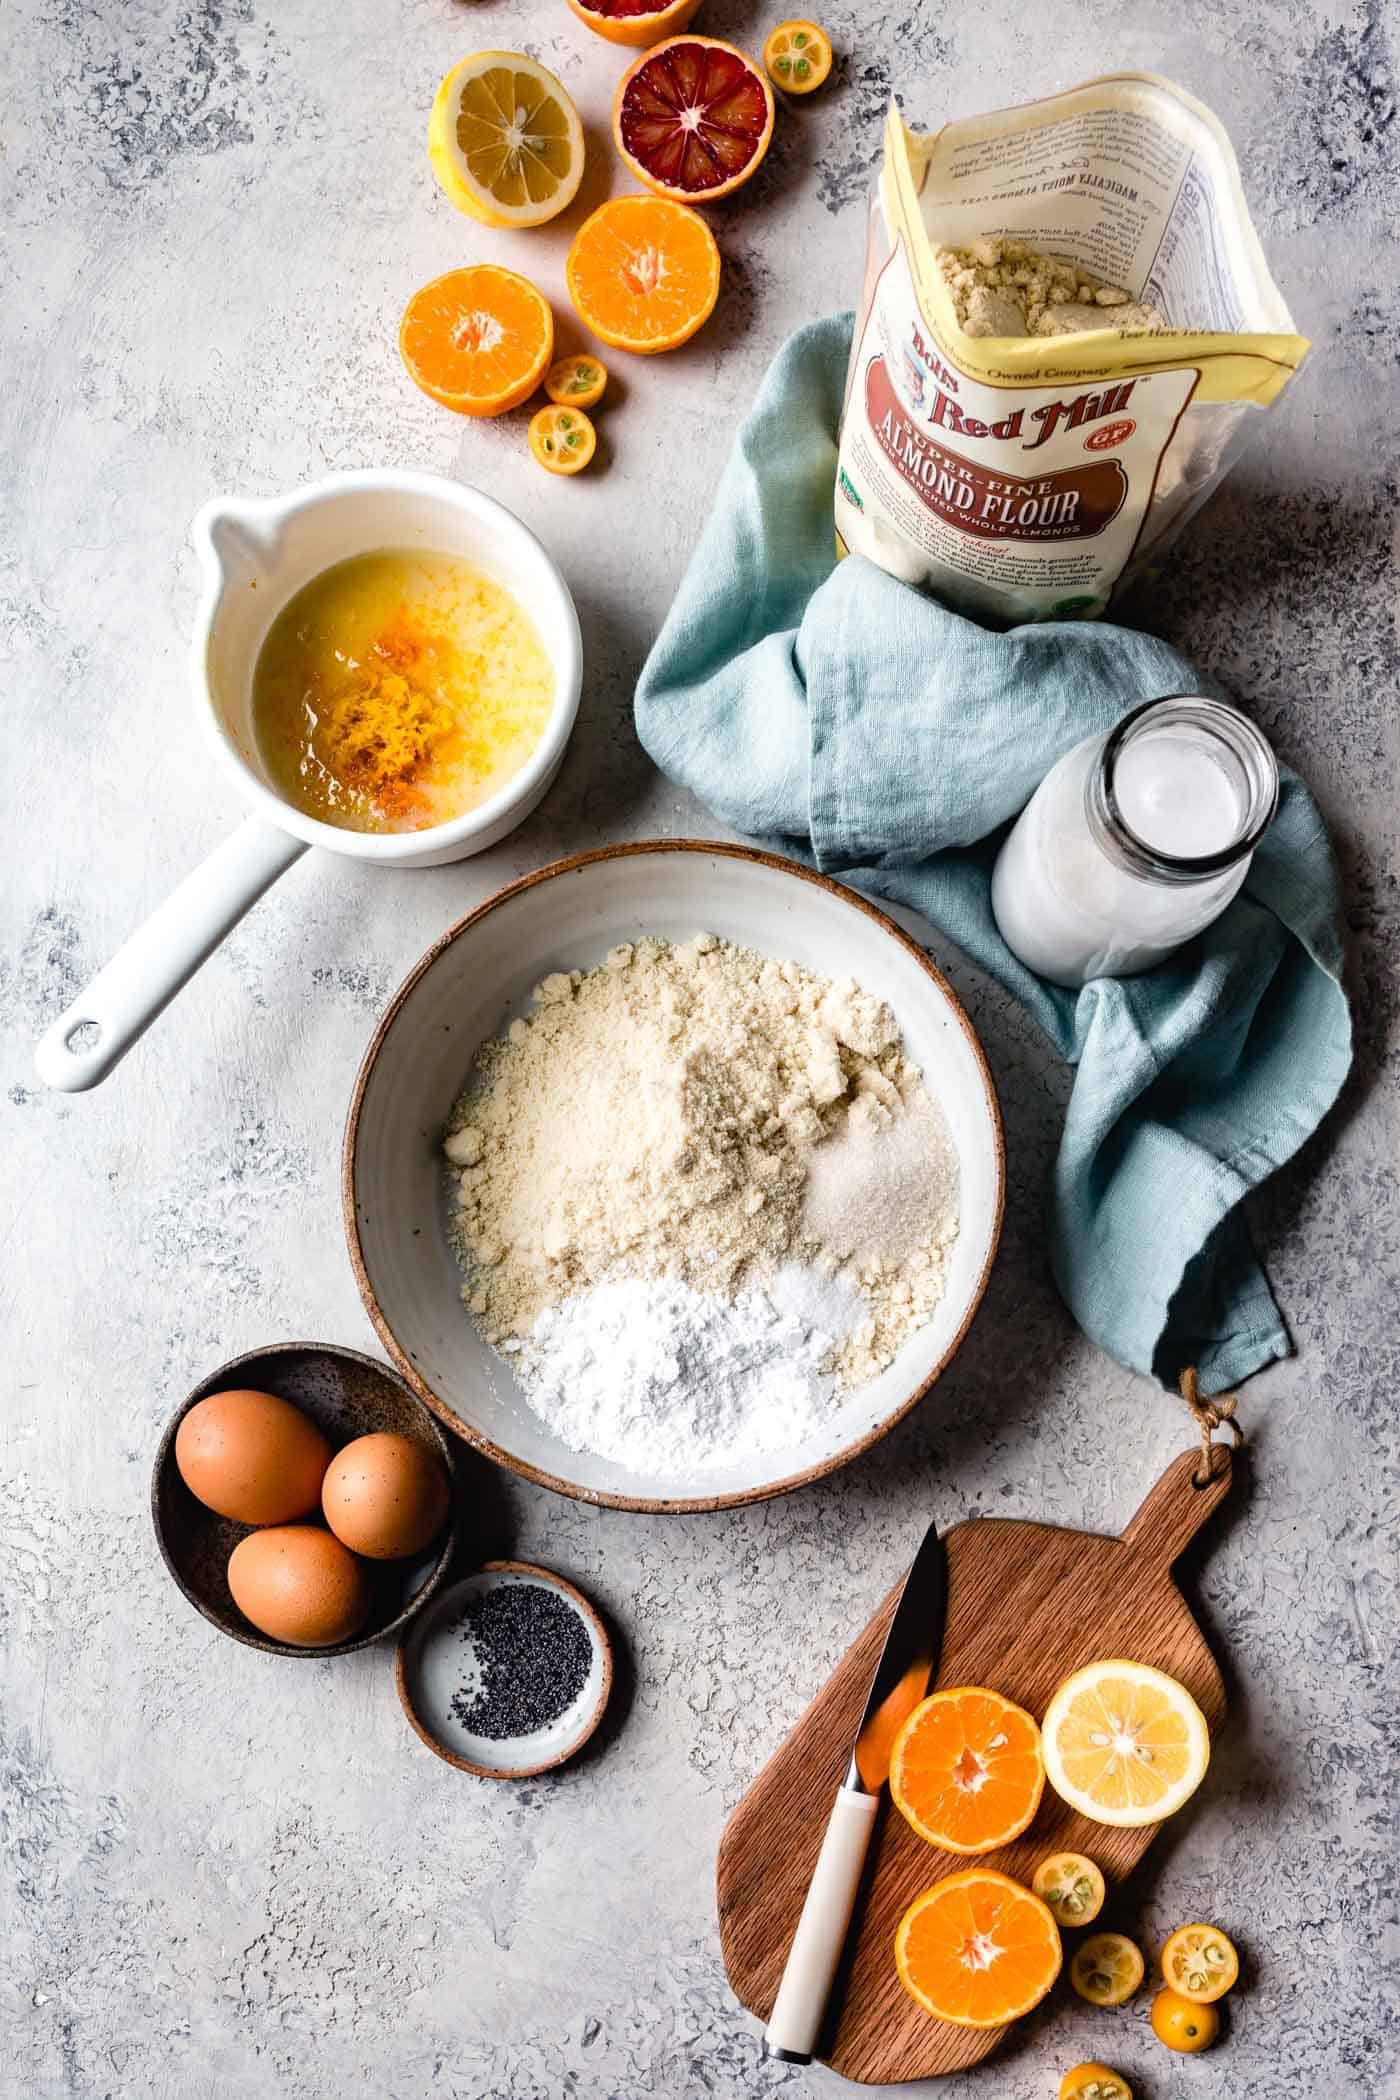 Ingredients for easy almond flour pancake recipe